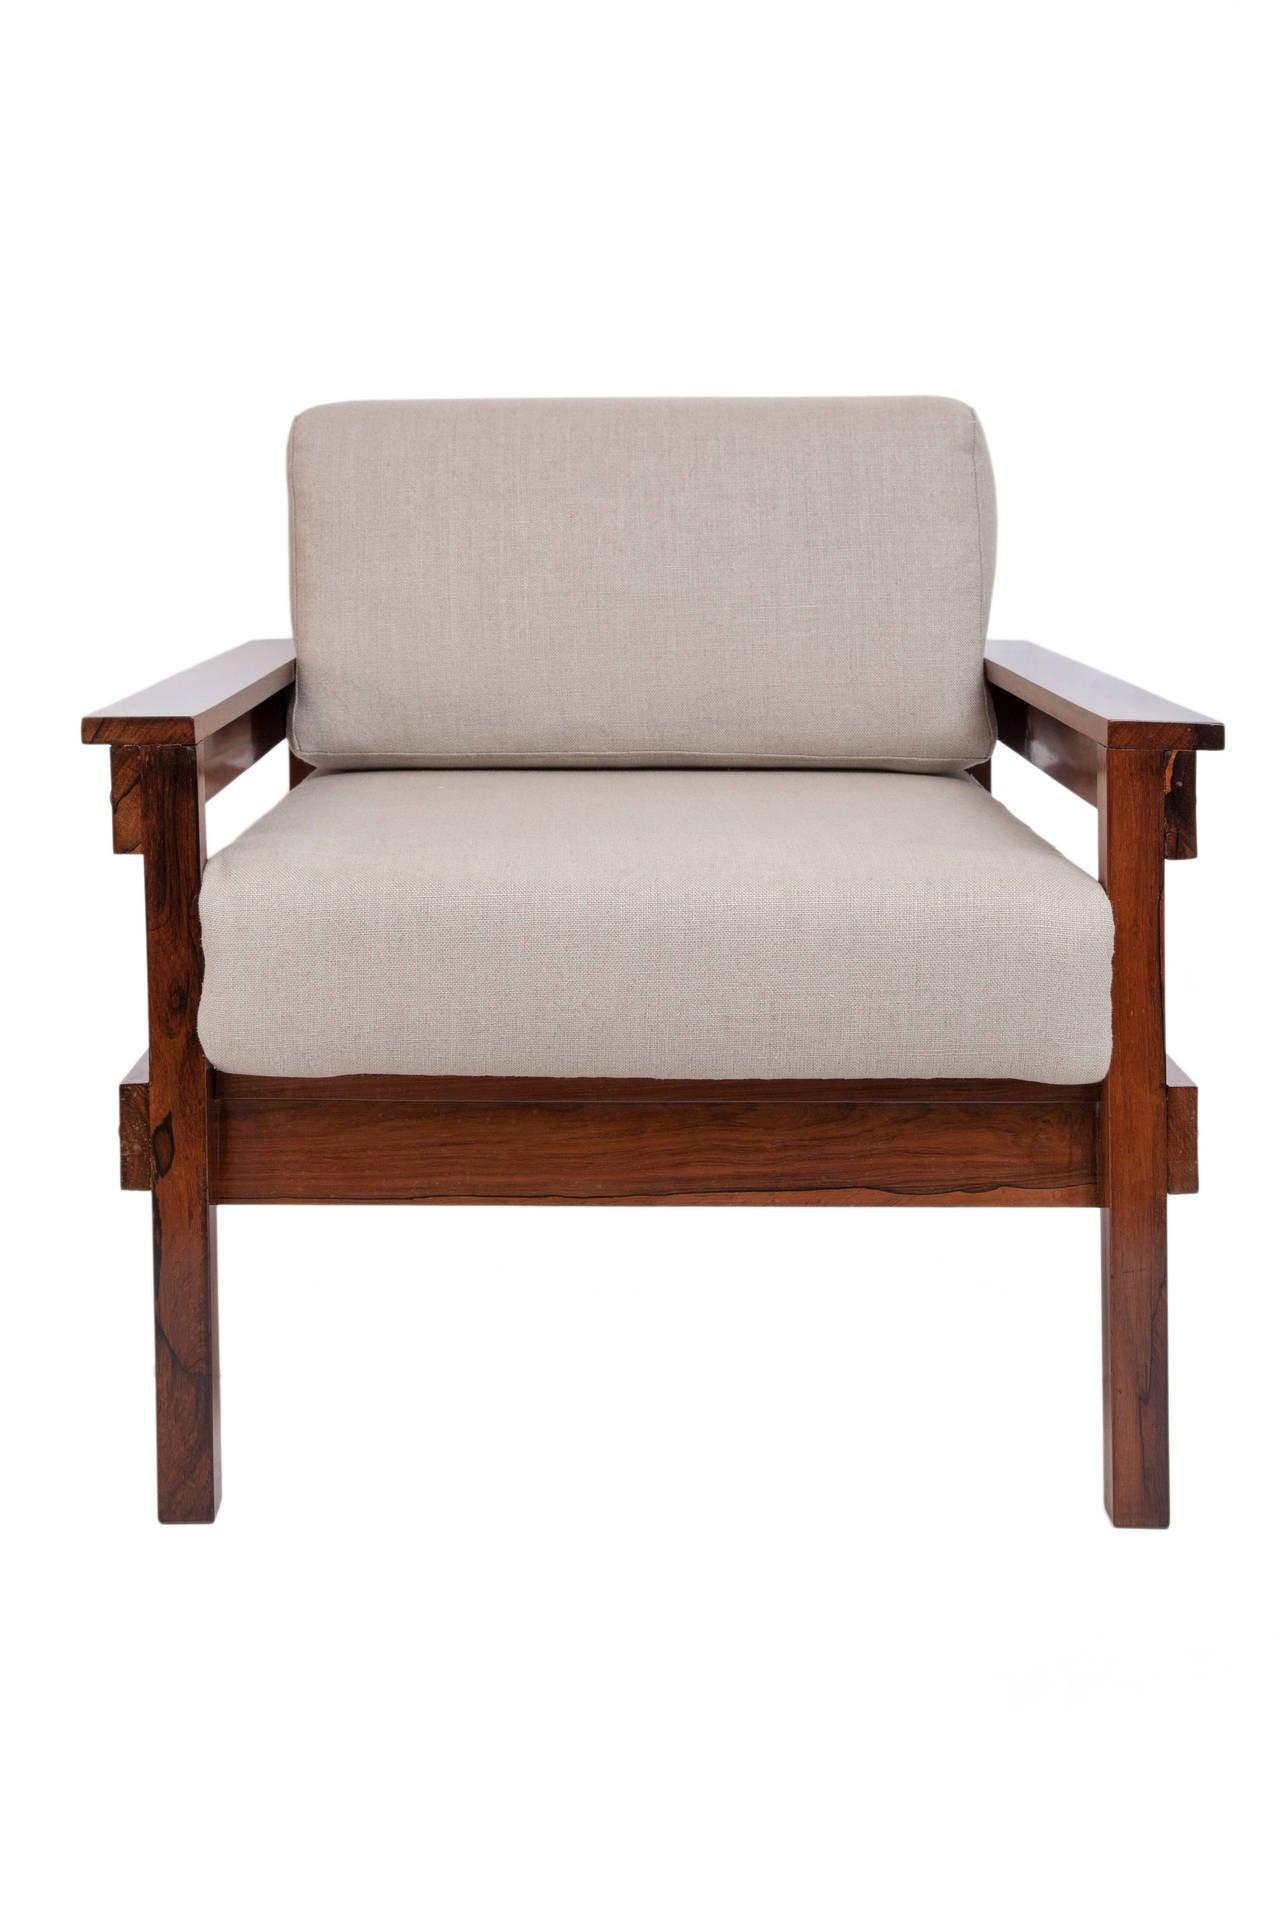 Pair of Midcentury Brazilian Jacaranda Armchairs Upholstered in Beige Linen For Sale 1